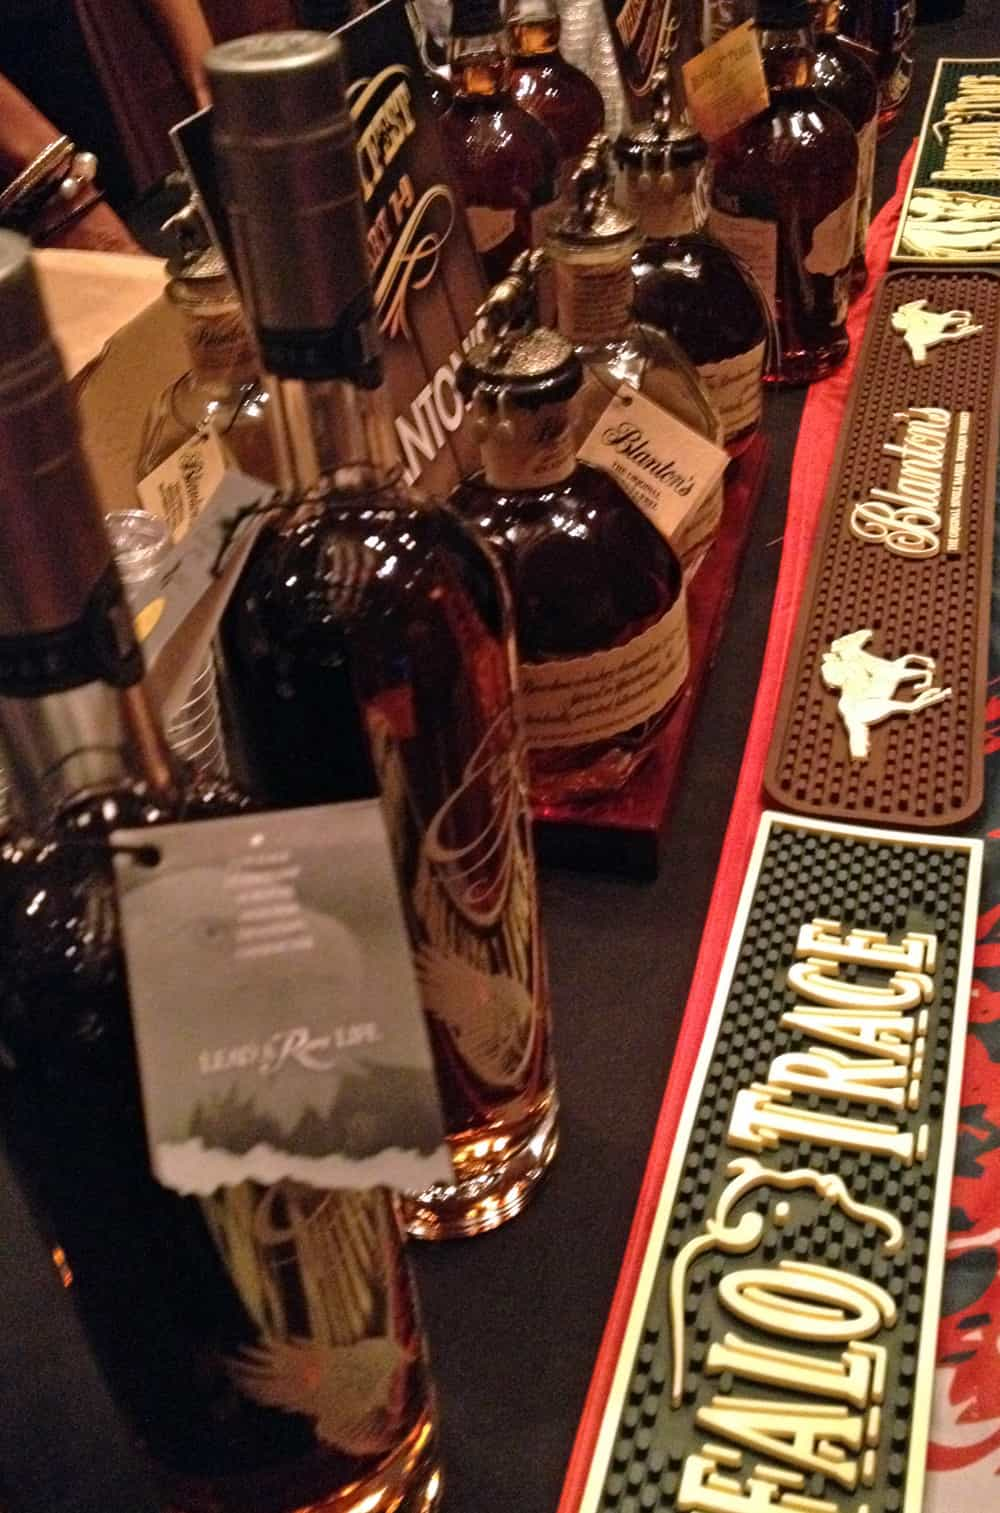 WhiskeyFest2014 - choices, choices, Las Vegas, NV